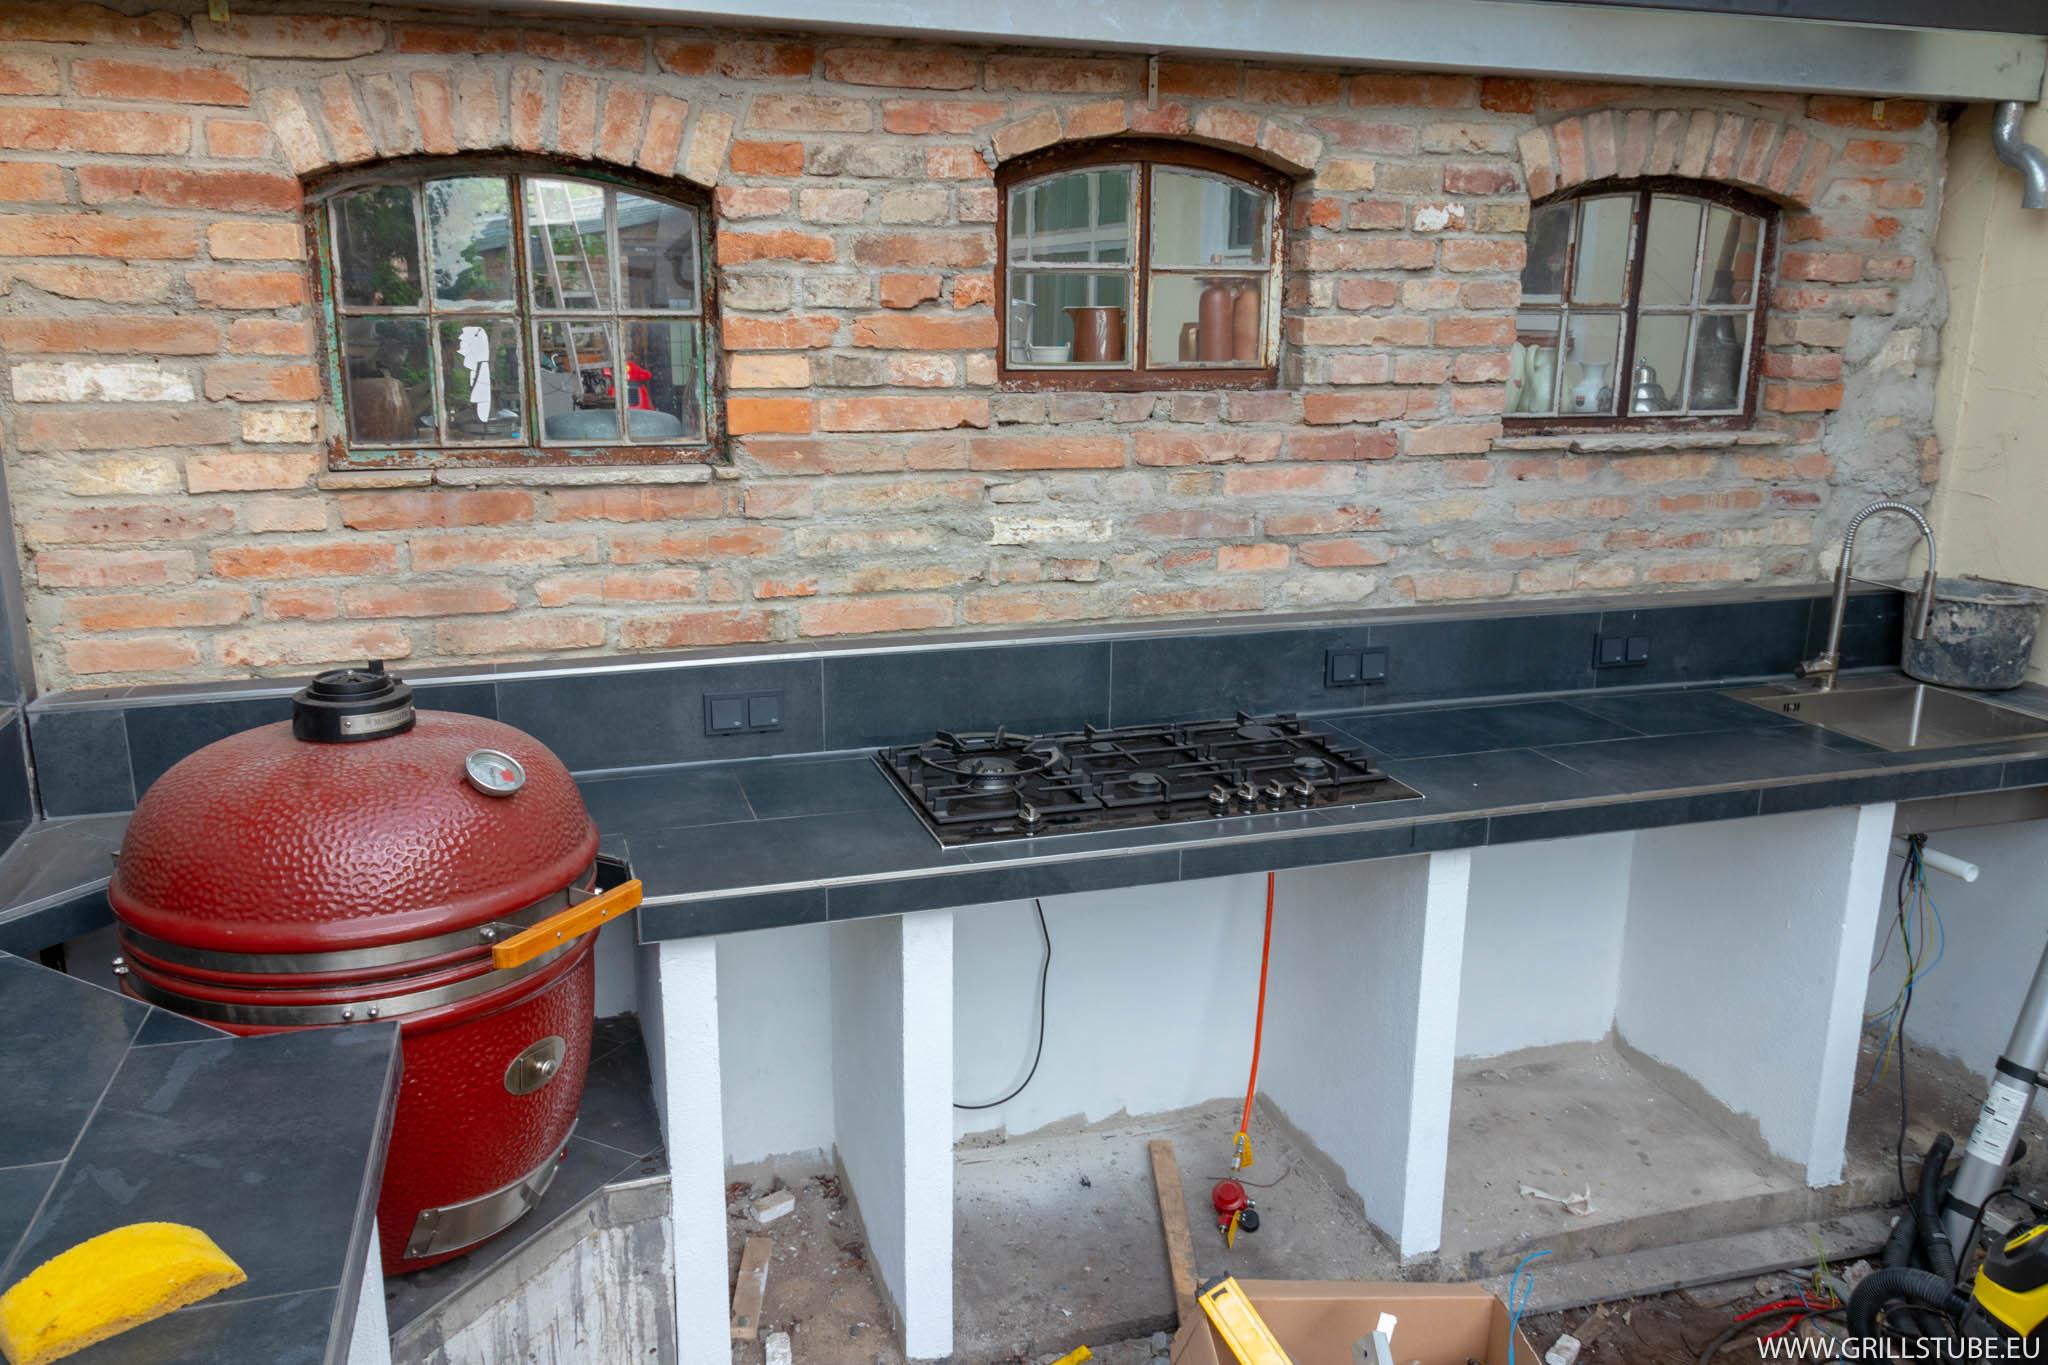 Outdoorküche Arbeitsplatte Ikea : Outdoorküche: elektroinstallation einbau geräte andys grillstube 2.0